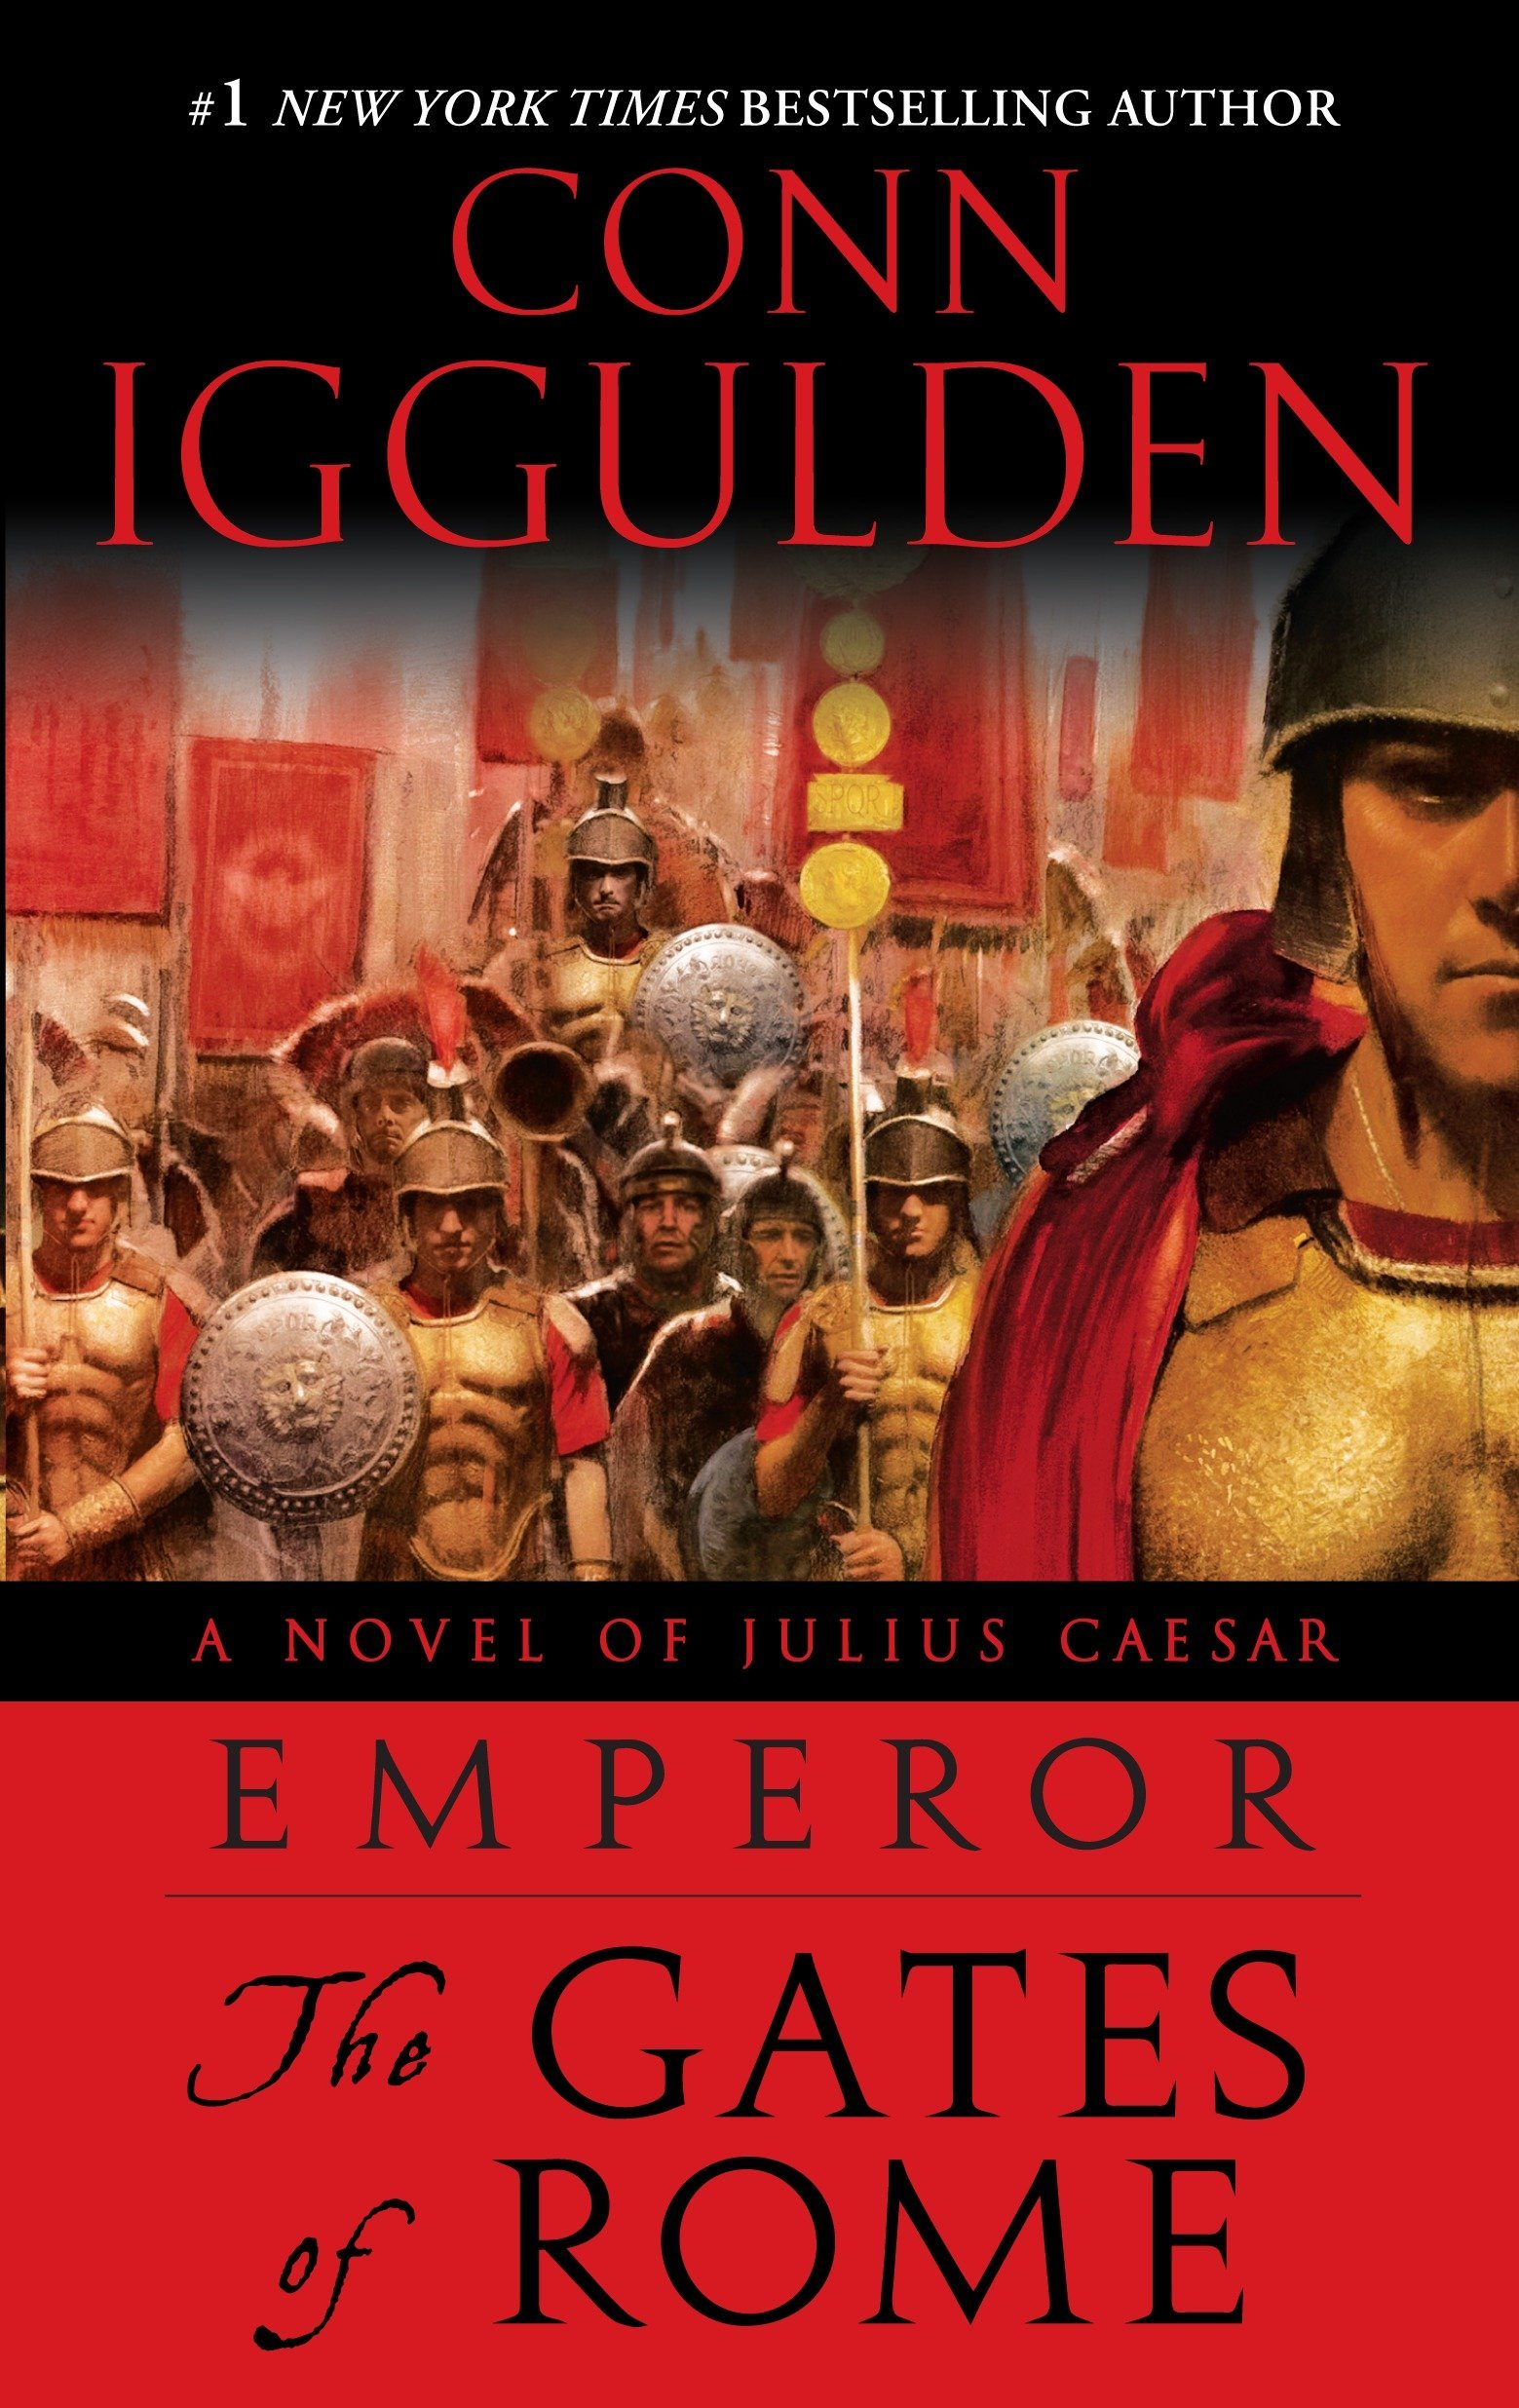 Amazon.com: Emperor: The Gates of Rome: A Novel of Julius Caesar  (9780385343015): Conn Iggulden: Books